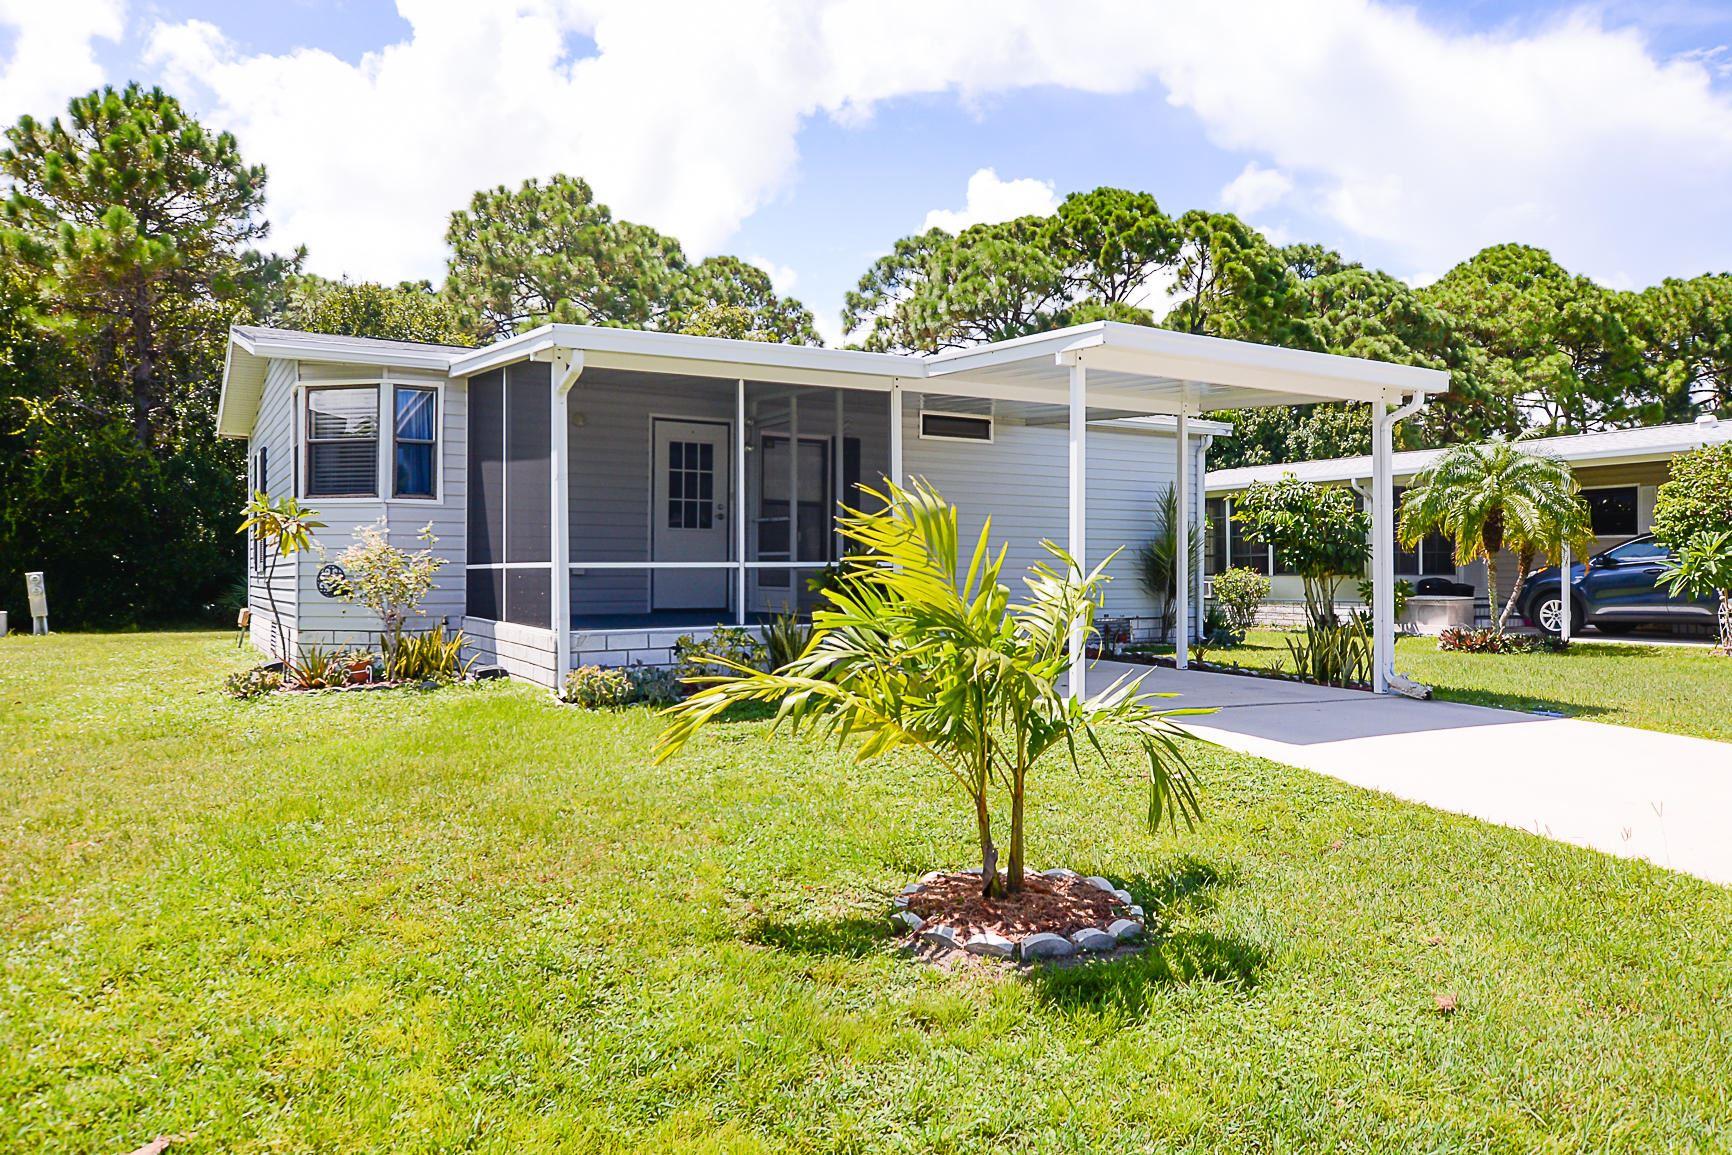 202 Mangrove Bay Place #L09, Fort Pierce, FL 34982 - #: RX-10646901